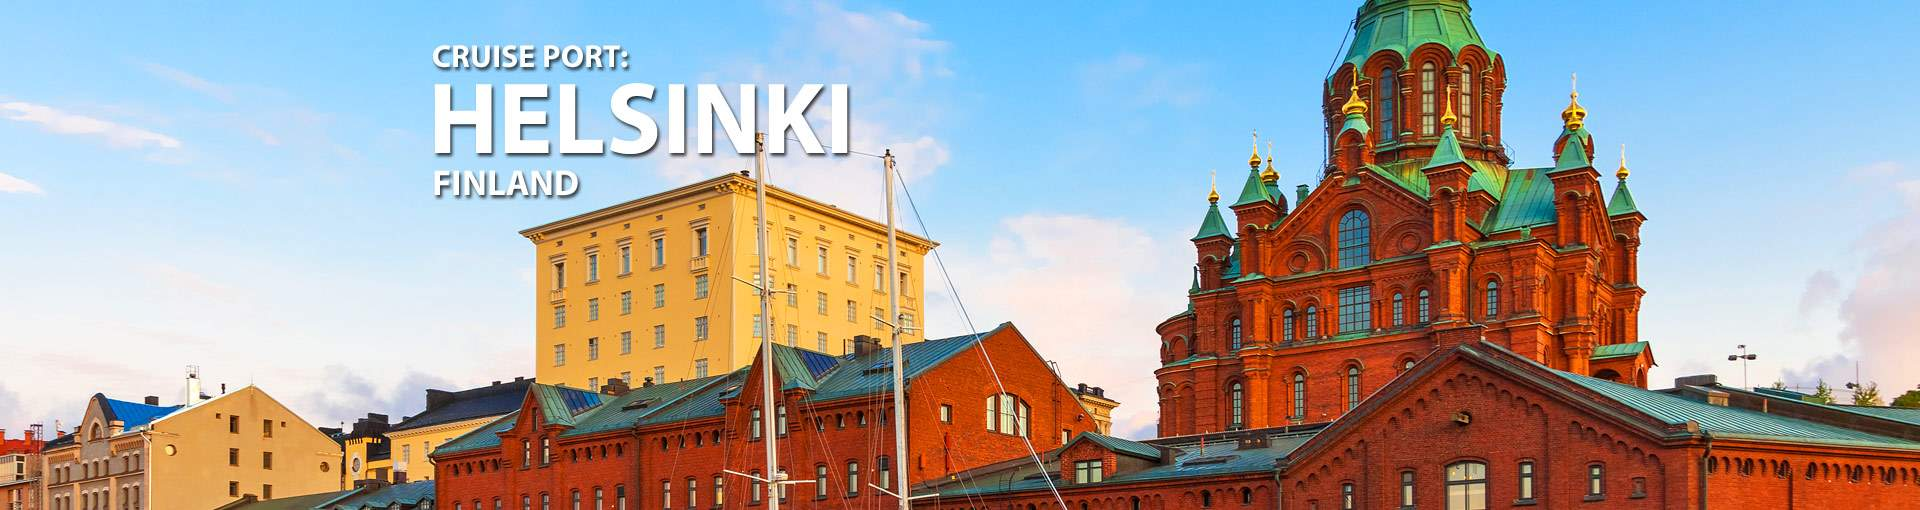 Cruises to Helsinki, Finland